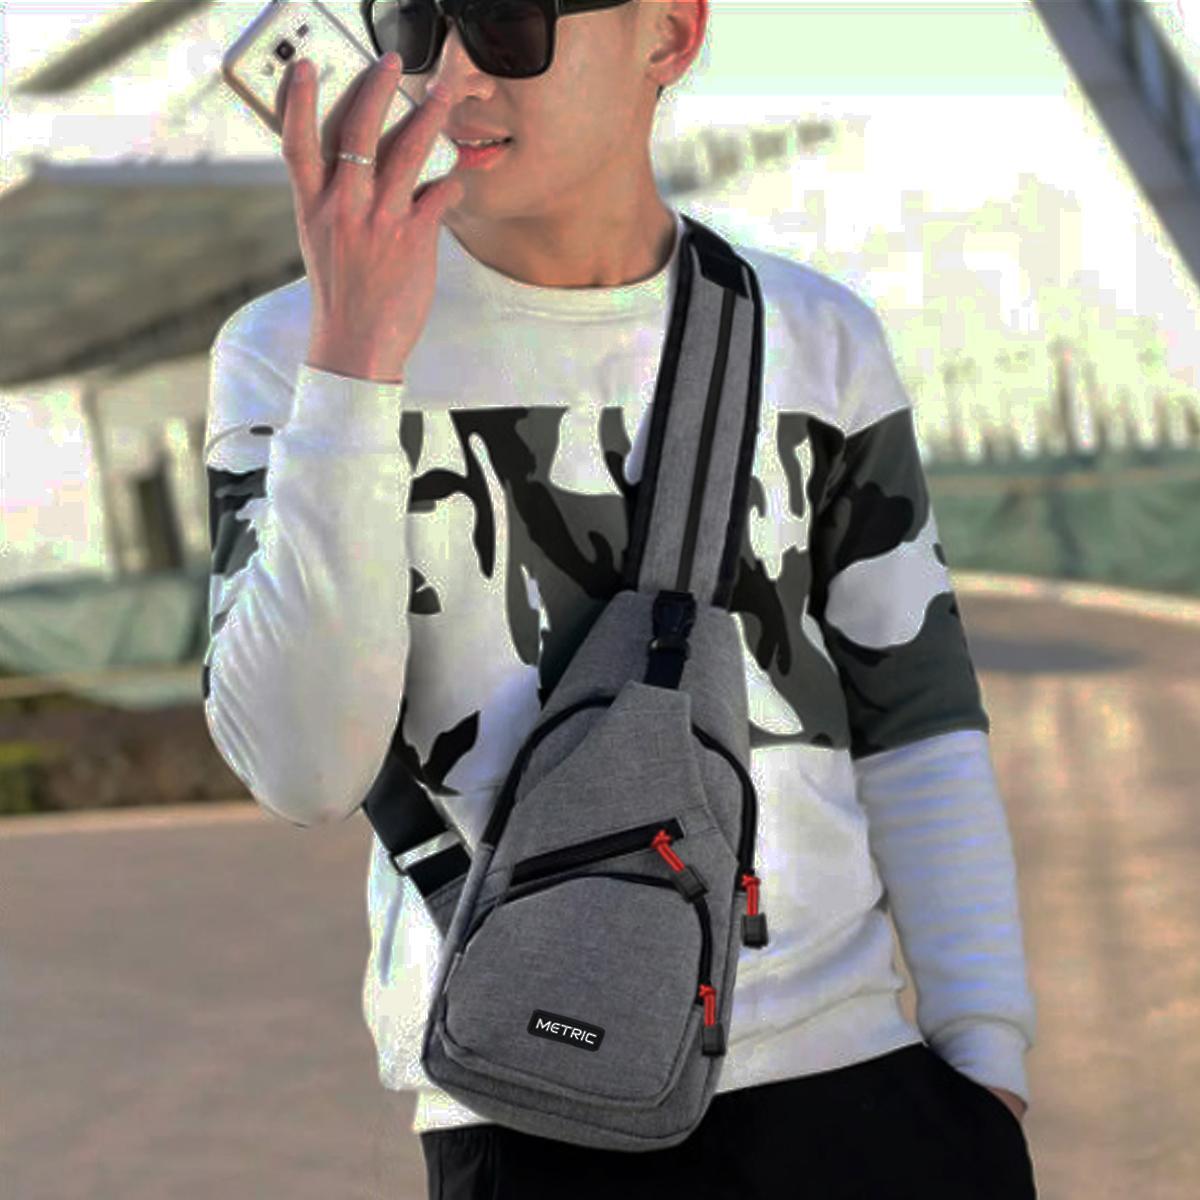 Metric Sling Bag Korea Tas Ransel Tali Satu Tas Waistbag Tas Selempang Tas Gadget Tas Smartphone Kode Artikel Mi004 Street Style Korean Design - Grey